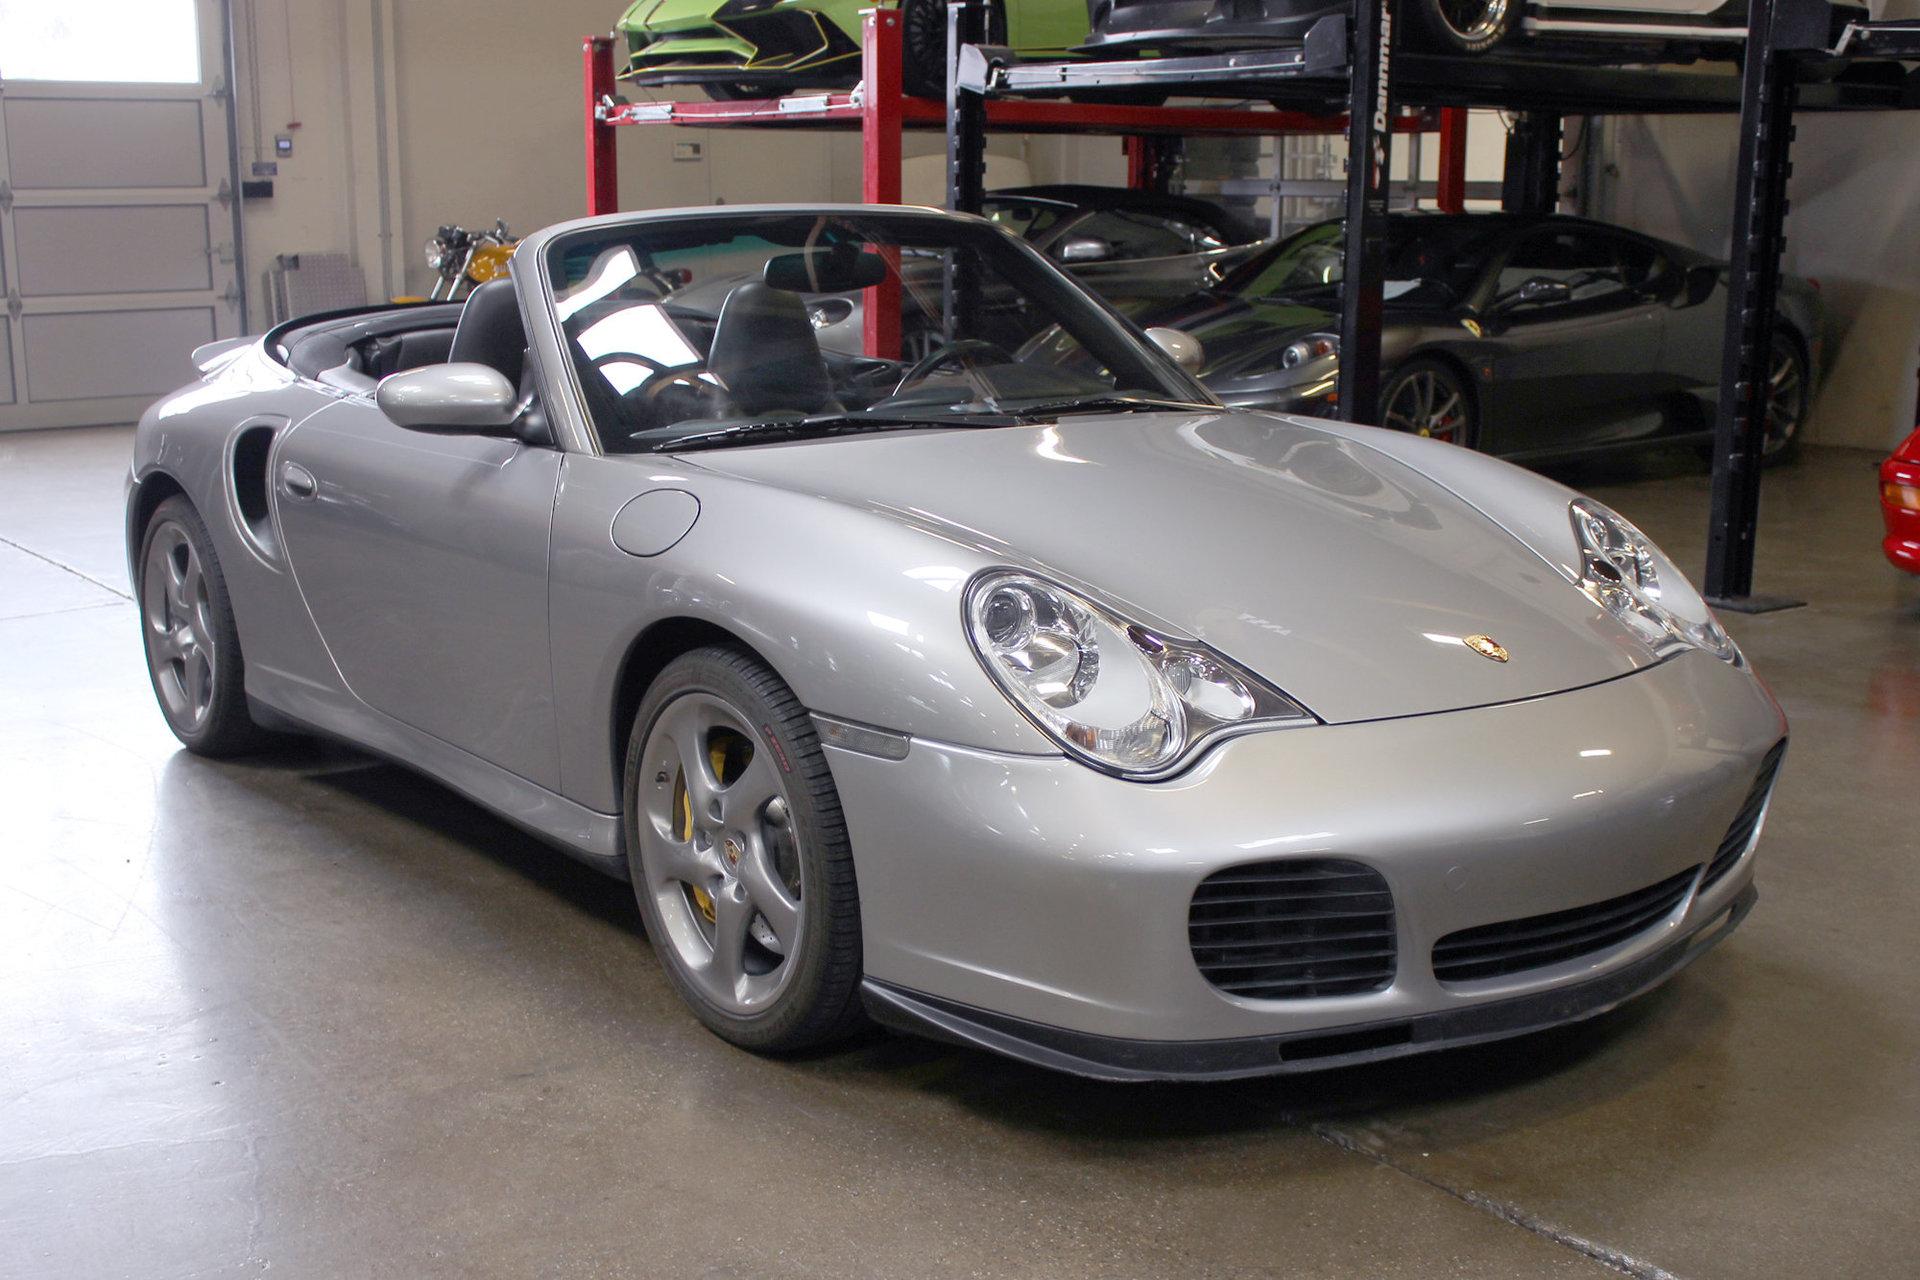 32354ebe45541 hd 2005 porsche 911 2dr cabriolet turbo s